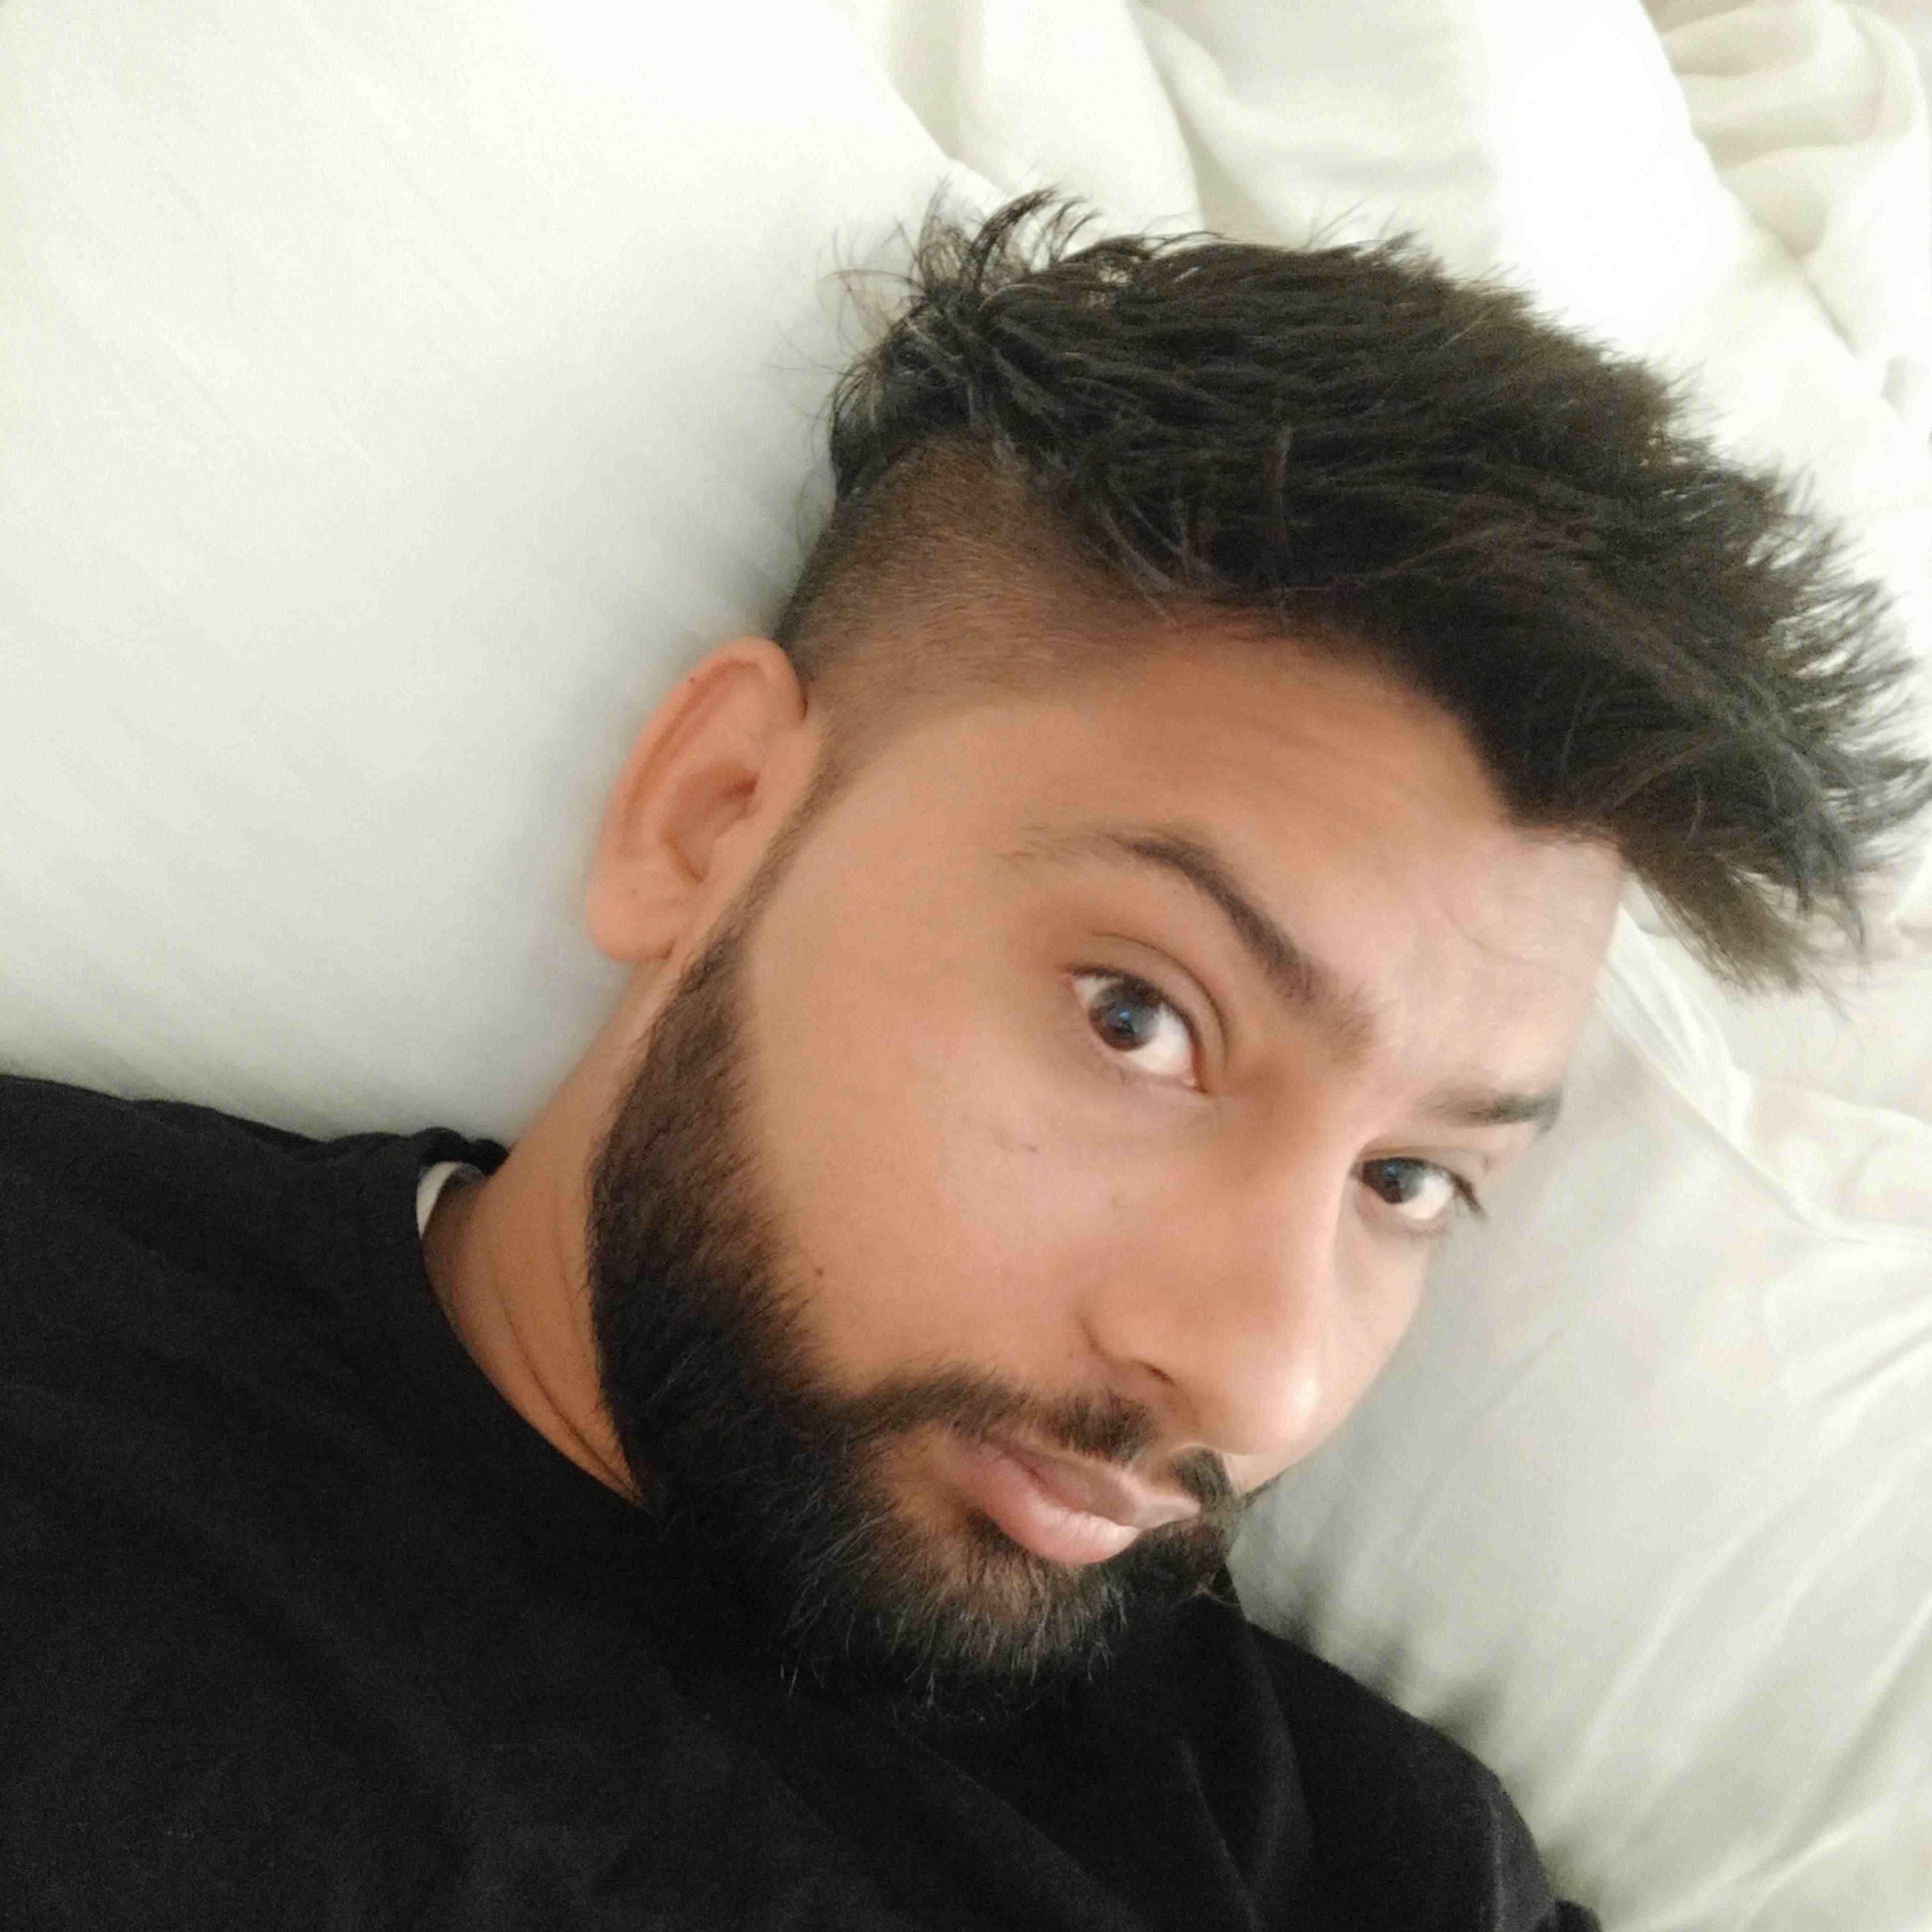 Yuvraaj Kamal Singh Chauhan Technophile, Entrepreneur, Engineer, Traveller, Nojoto